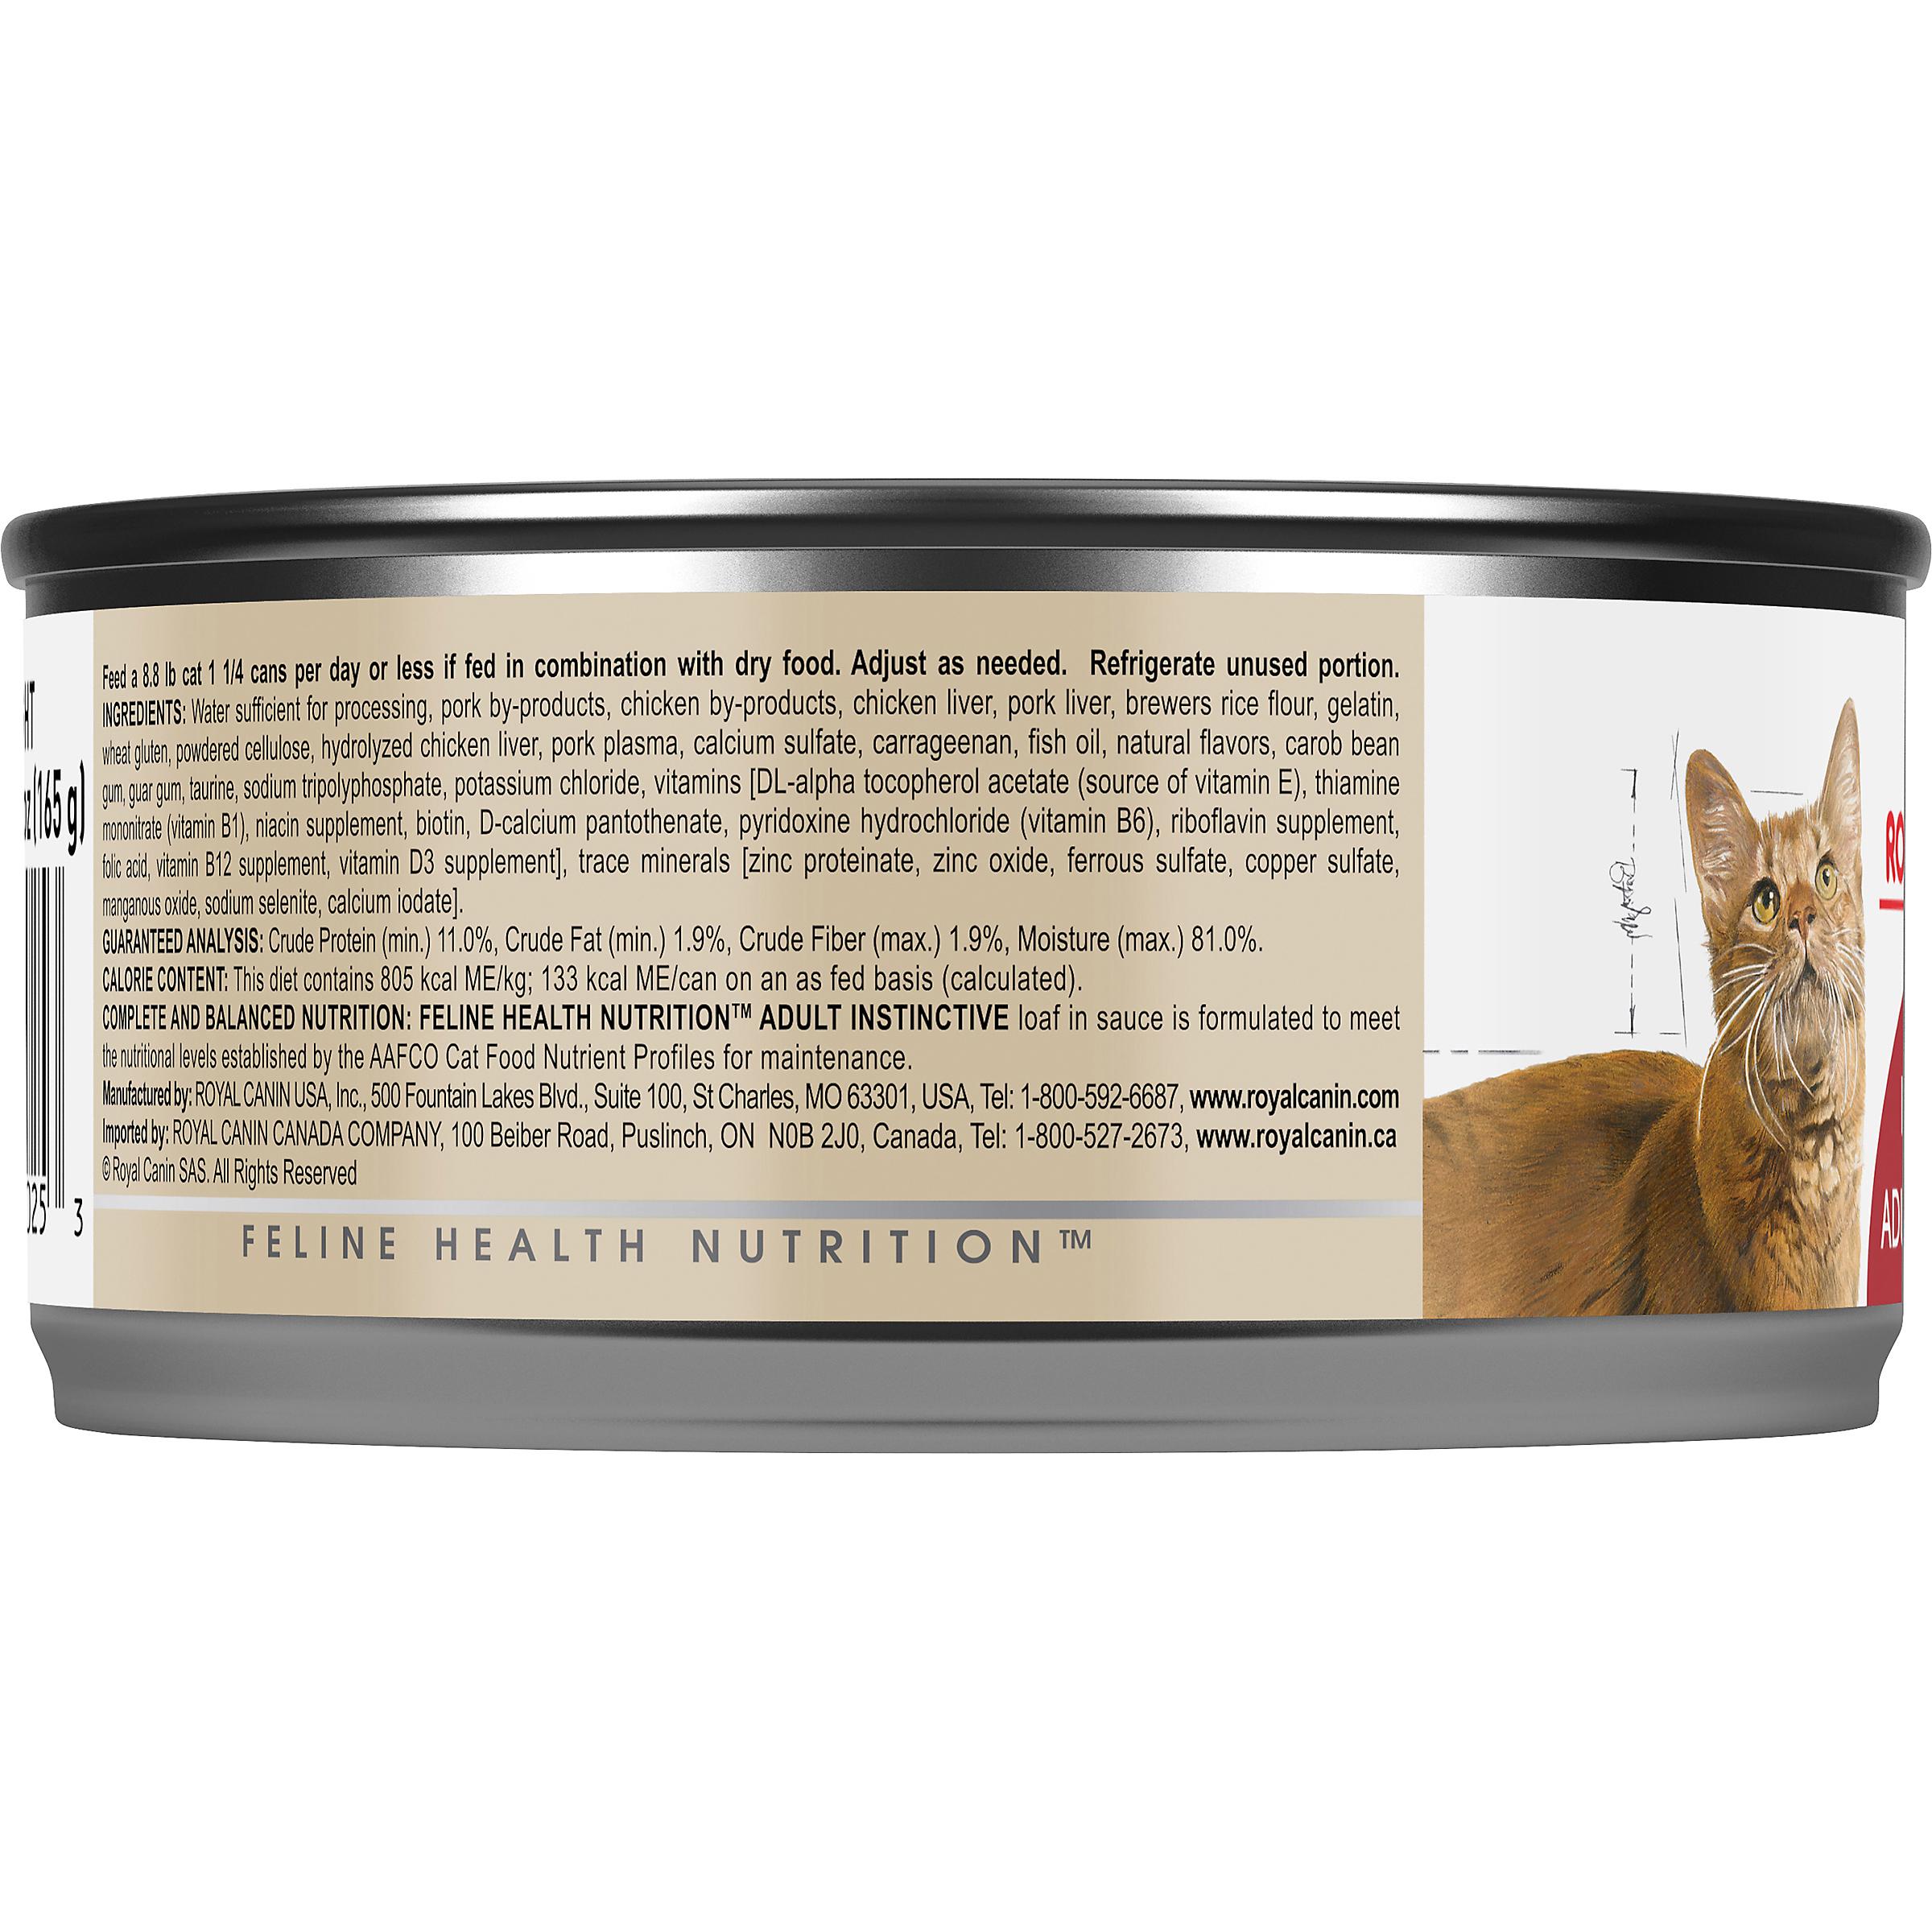 Royal Canin Feline Health Nutrition Adult Instinctive Loaf In Sauce Canned Cat Food